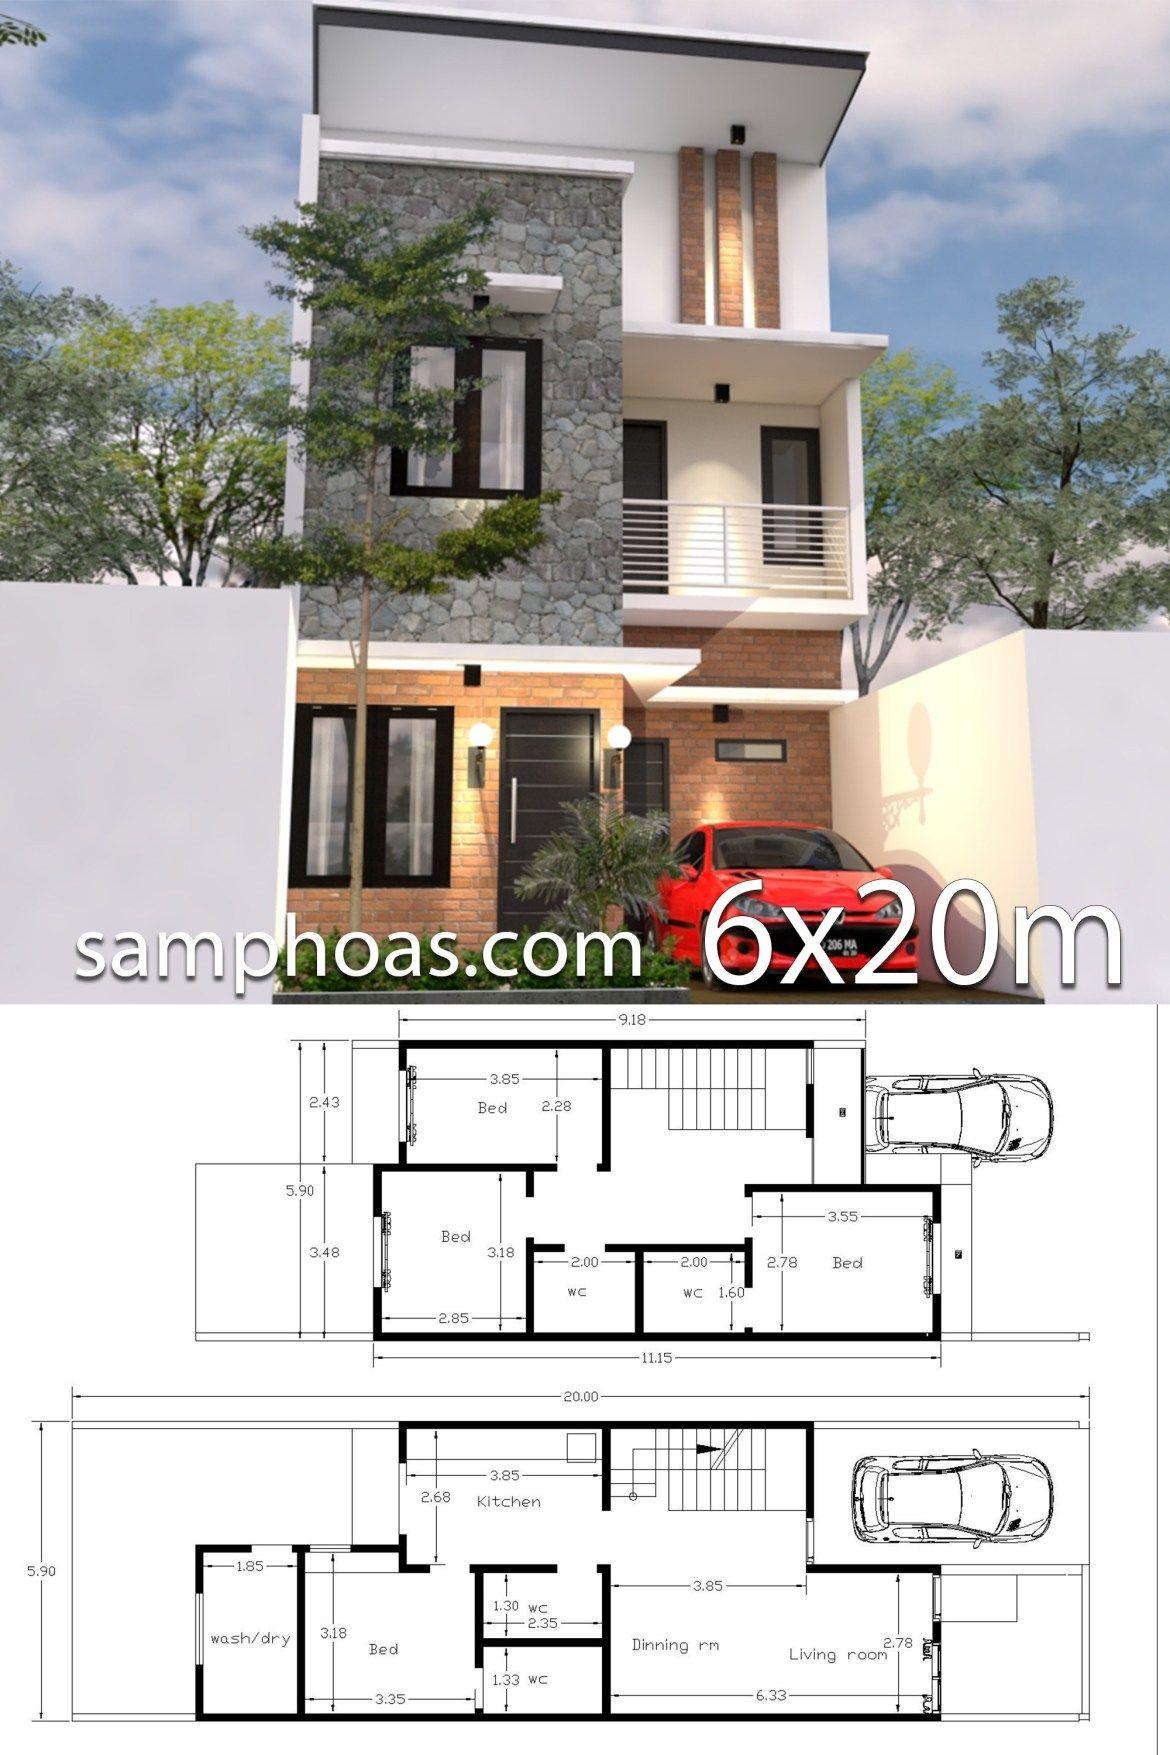 6x20m House Design 3d Plan With 4 Bedrooms Samphoas Plansearch 3d House Plans Model House Plan Architectural House Plans